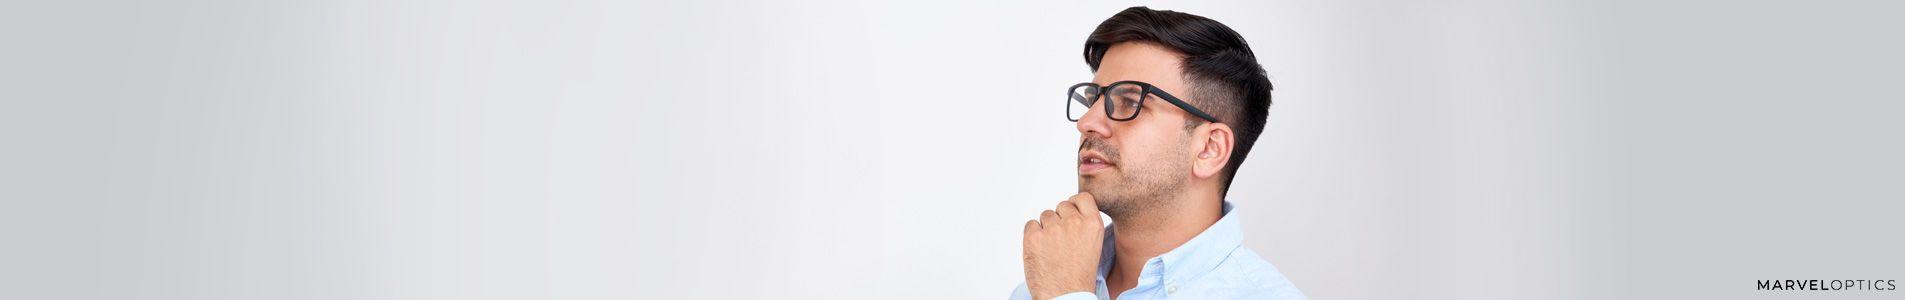 Eyeglasses manufacturing process header